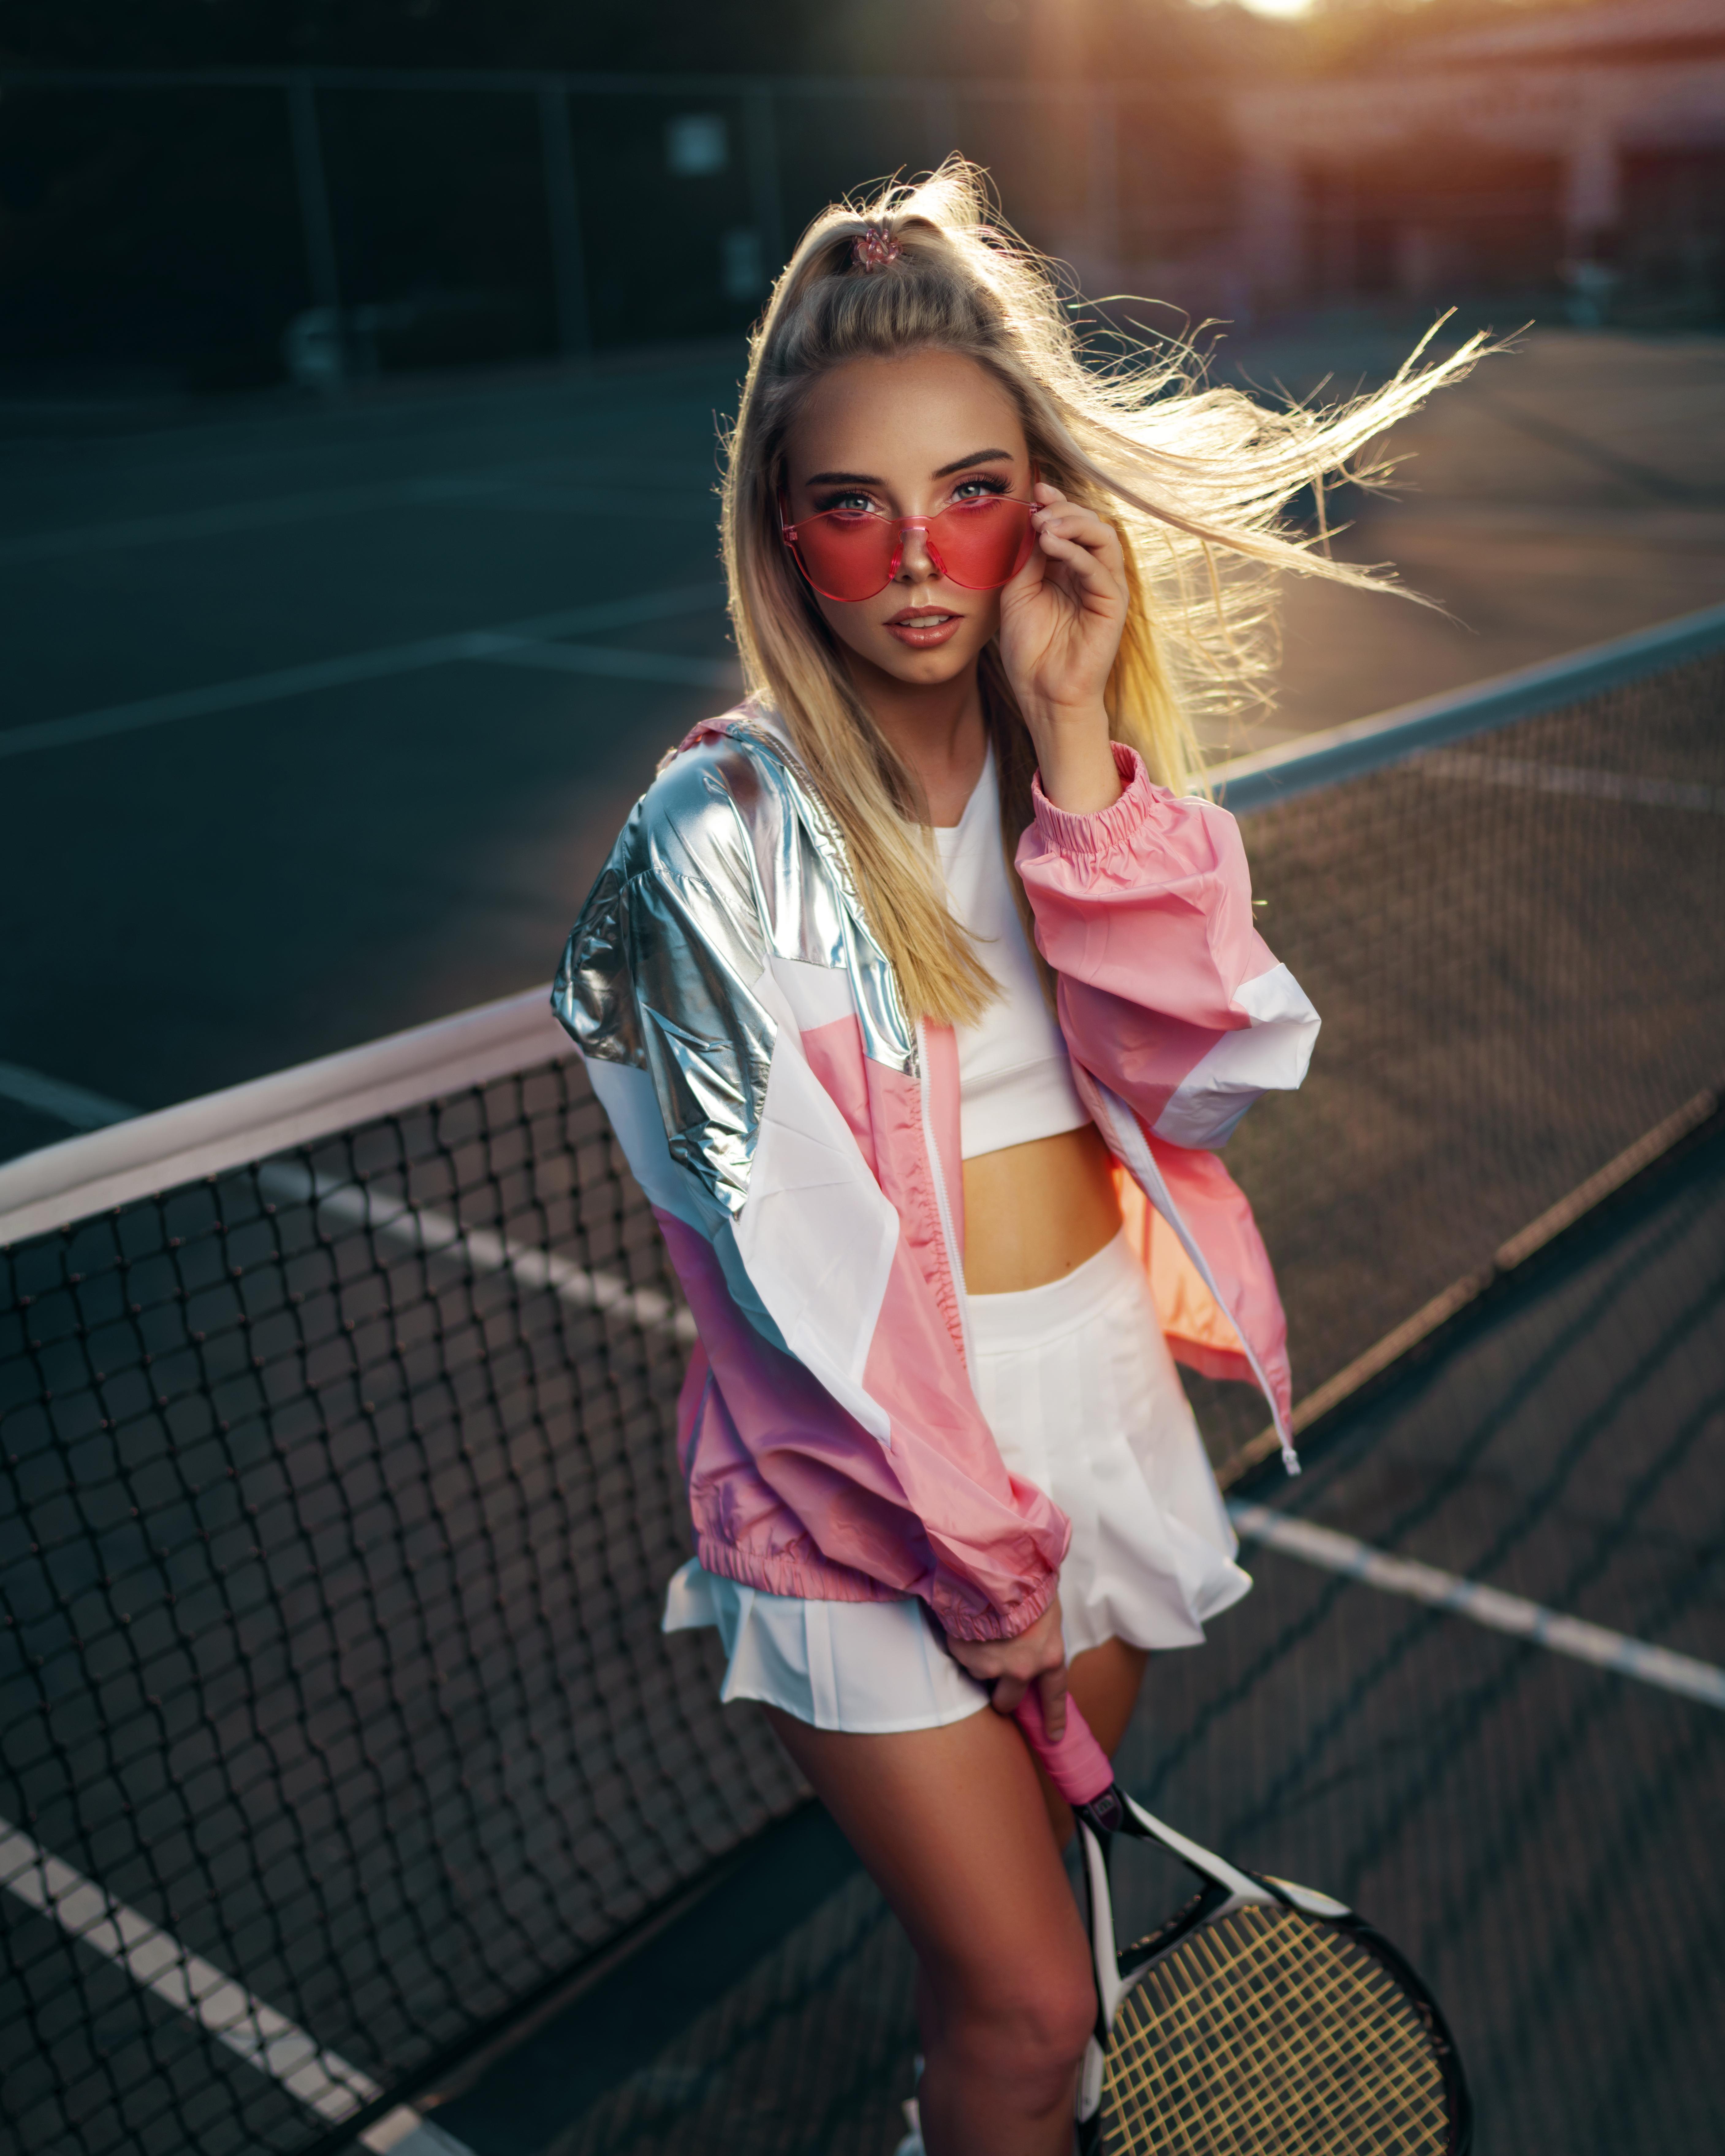 photo of woman holding tennis racquet